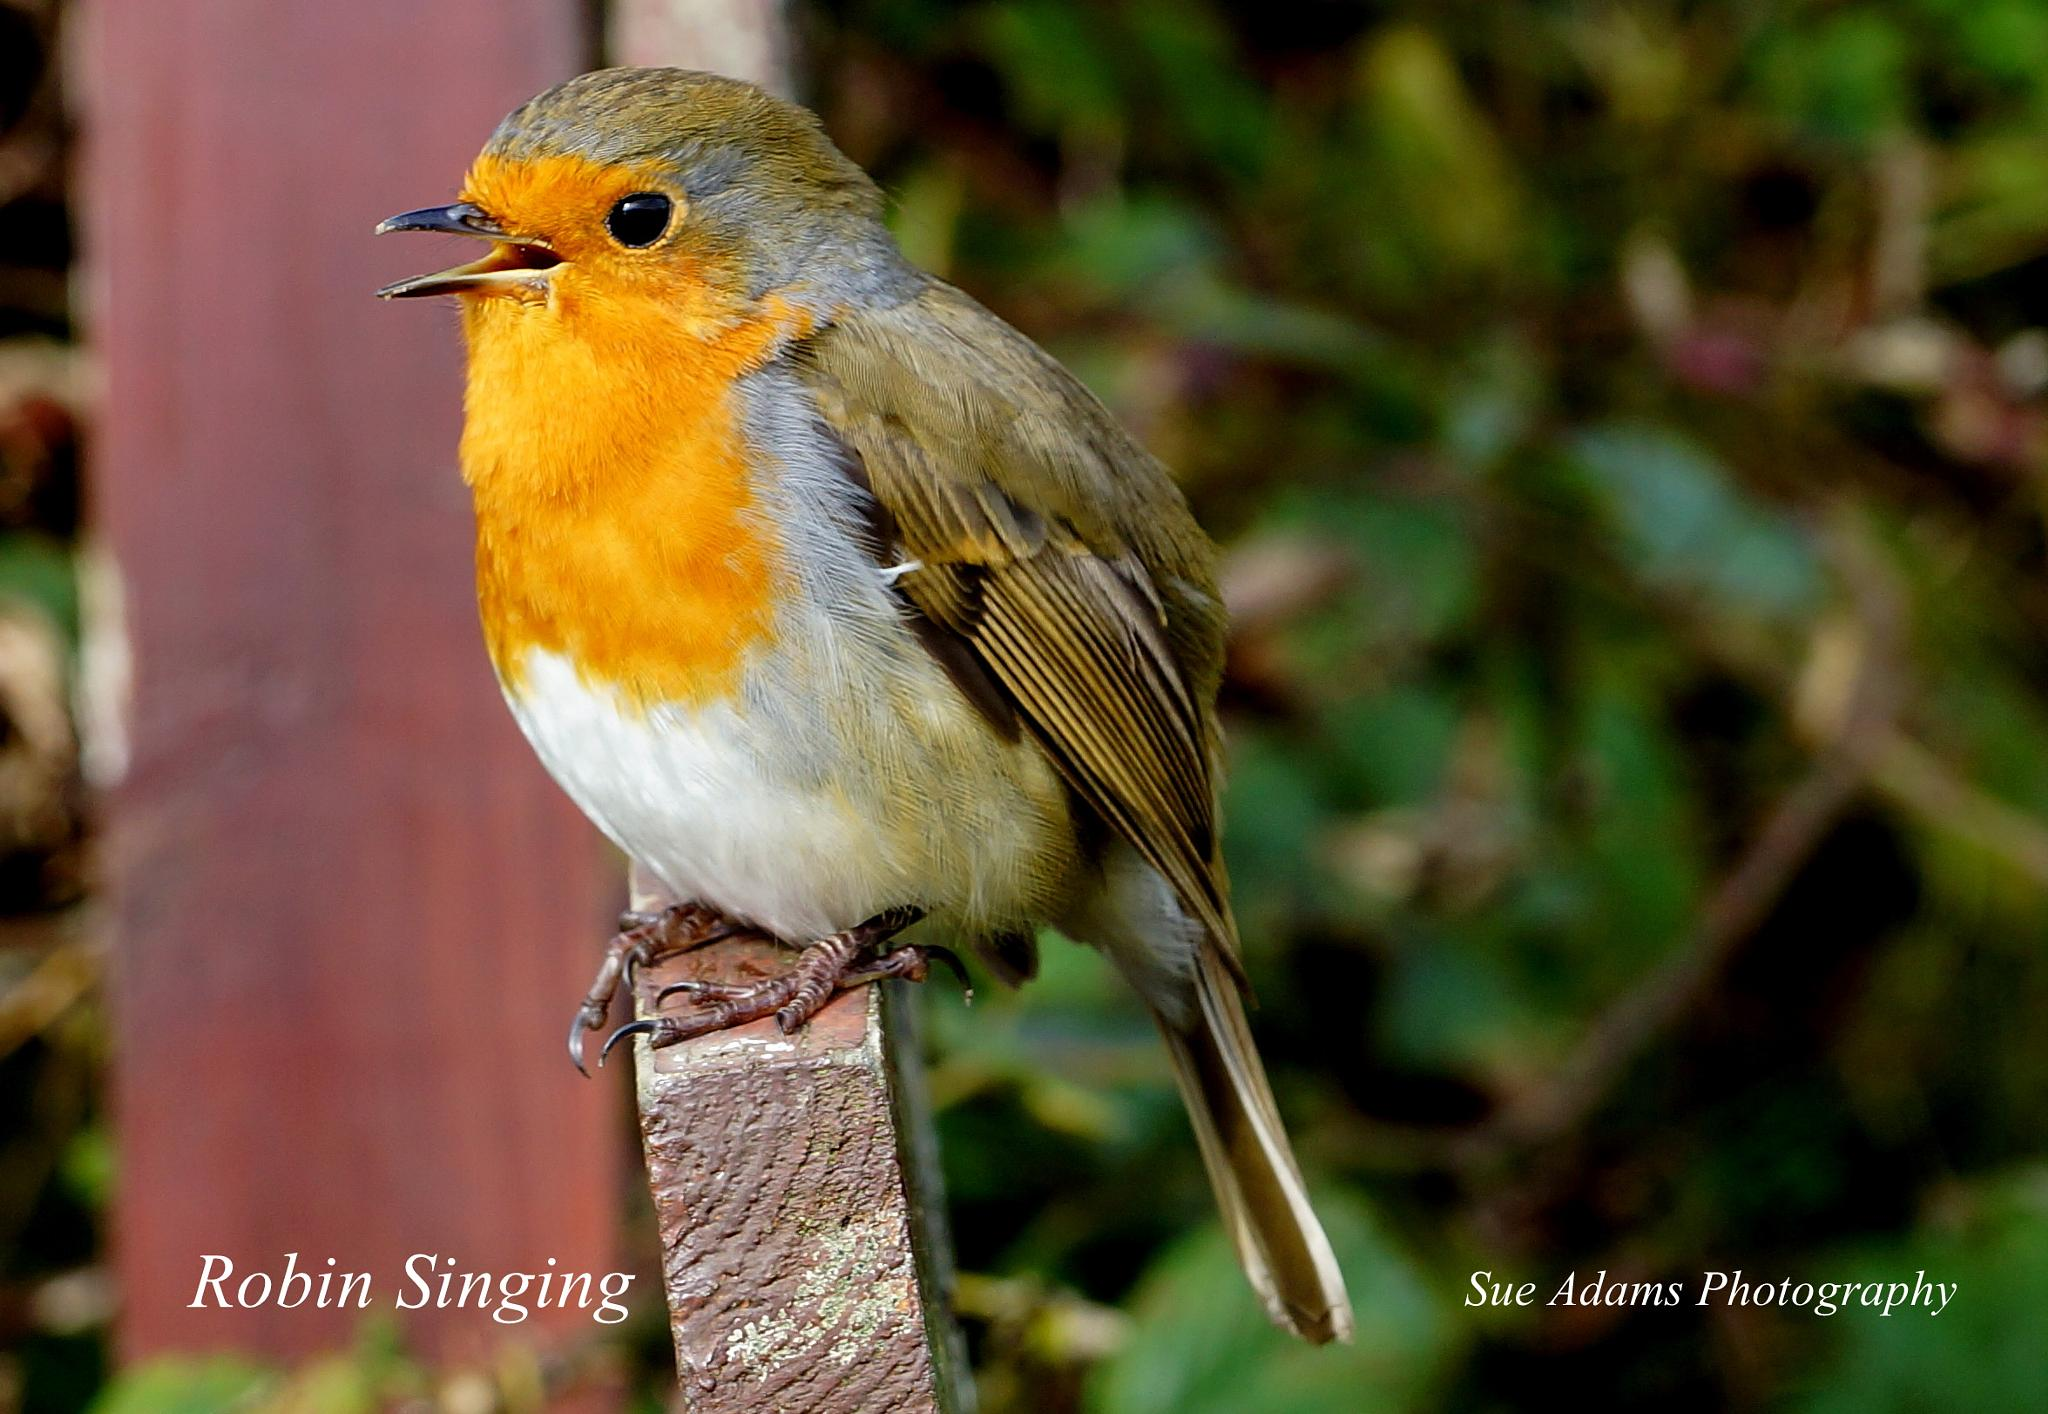 Robin Singing by Sue Adams Photography